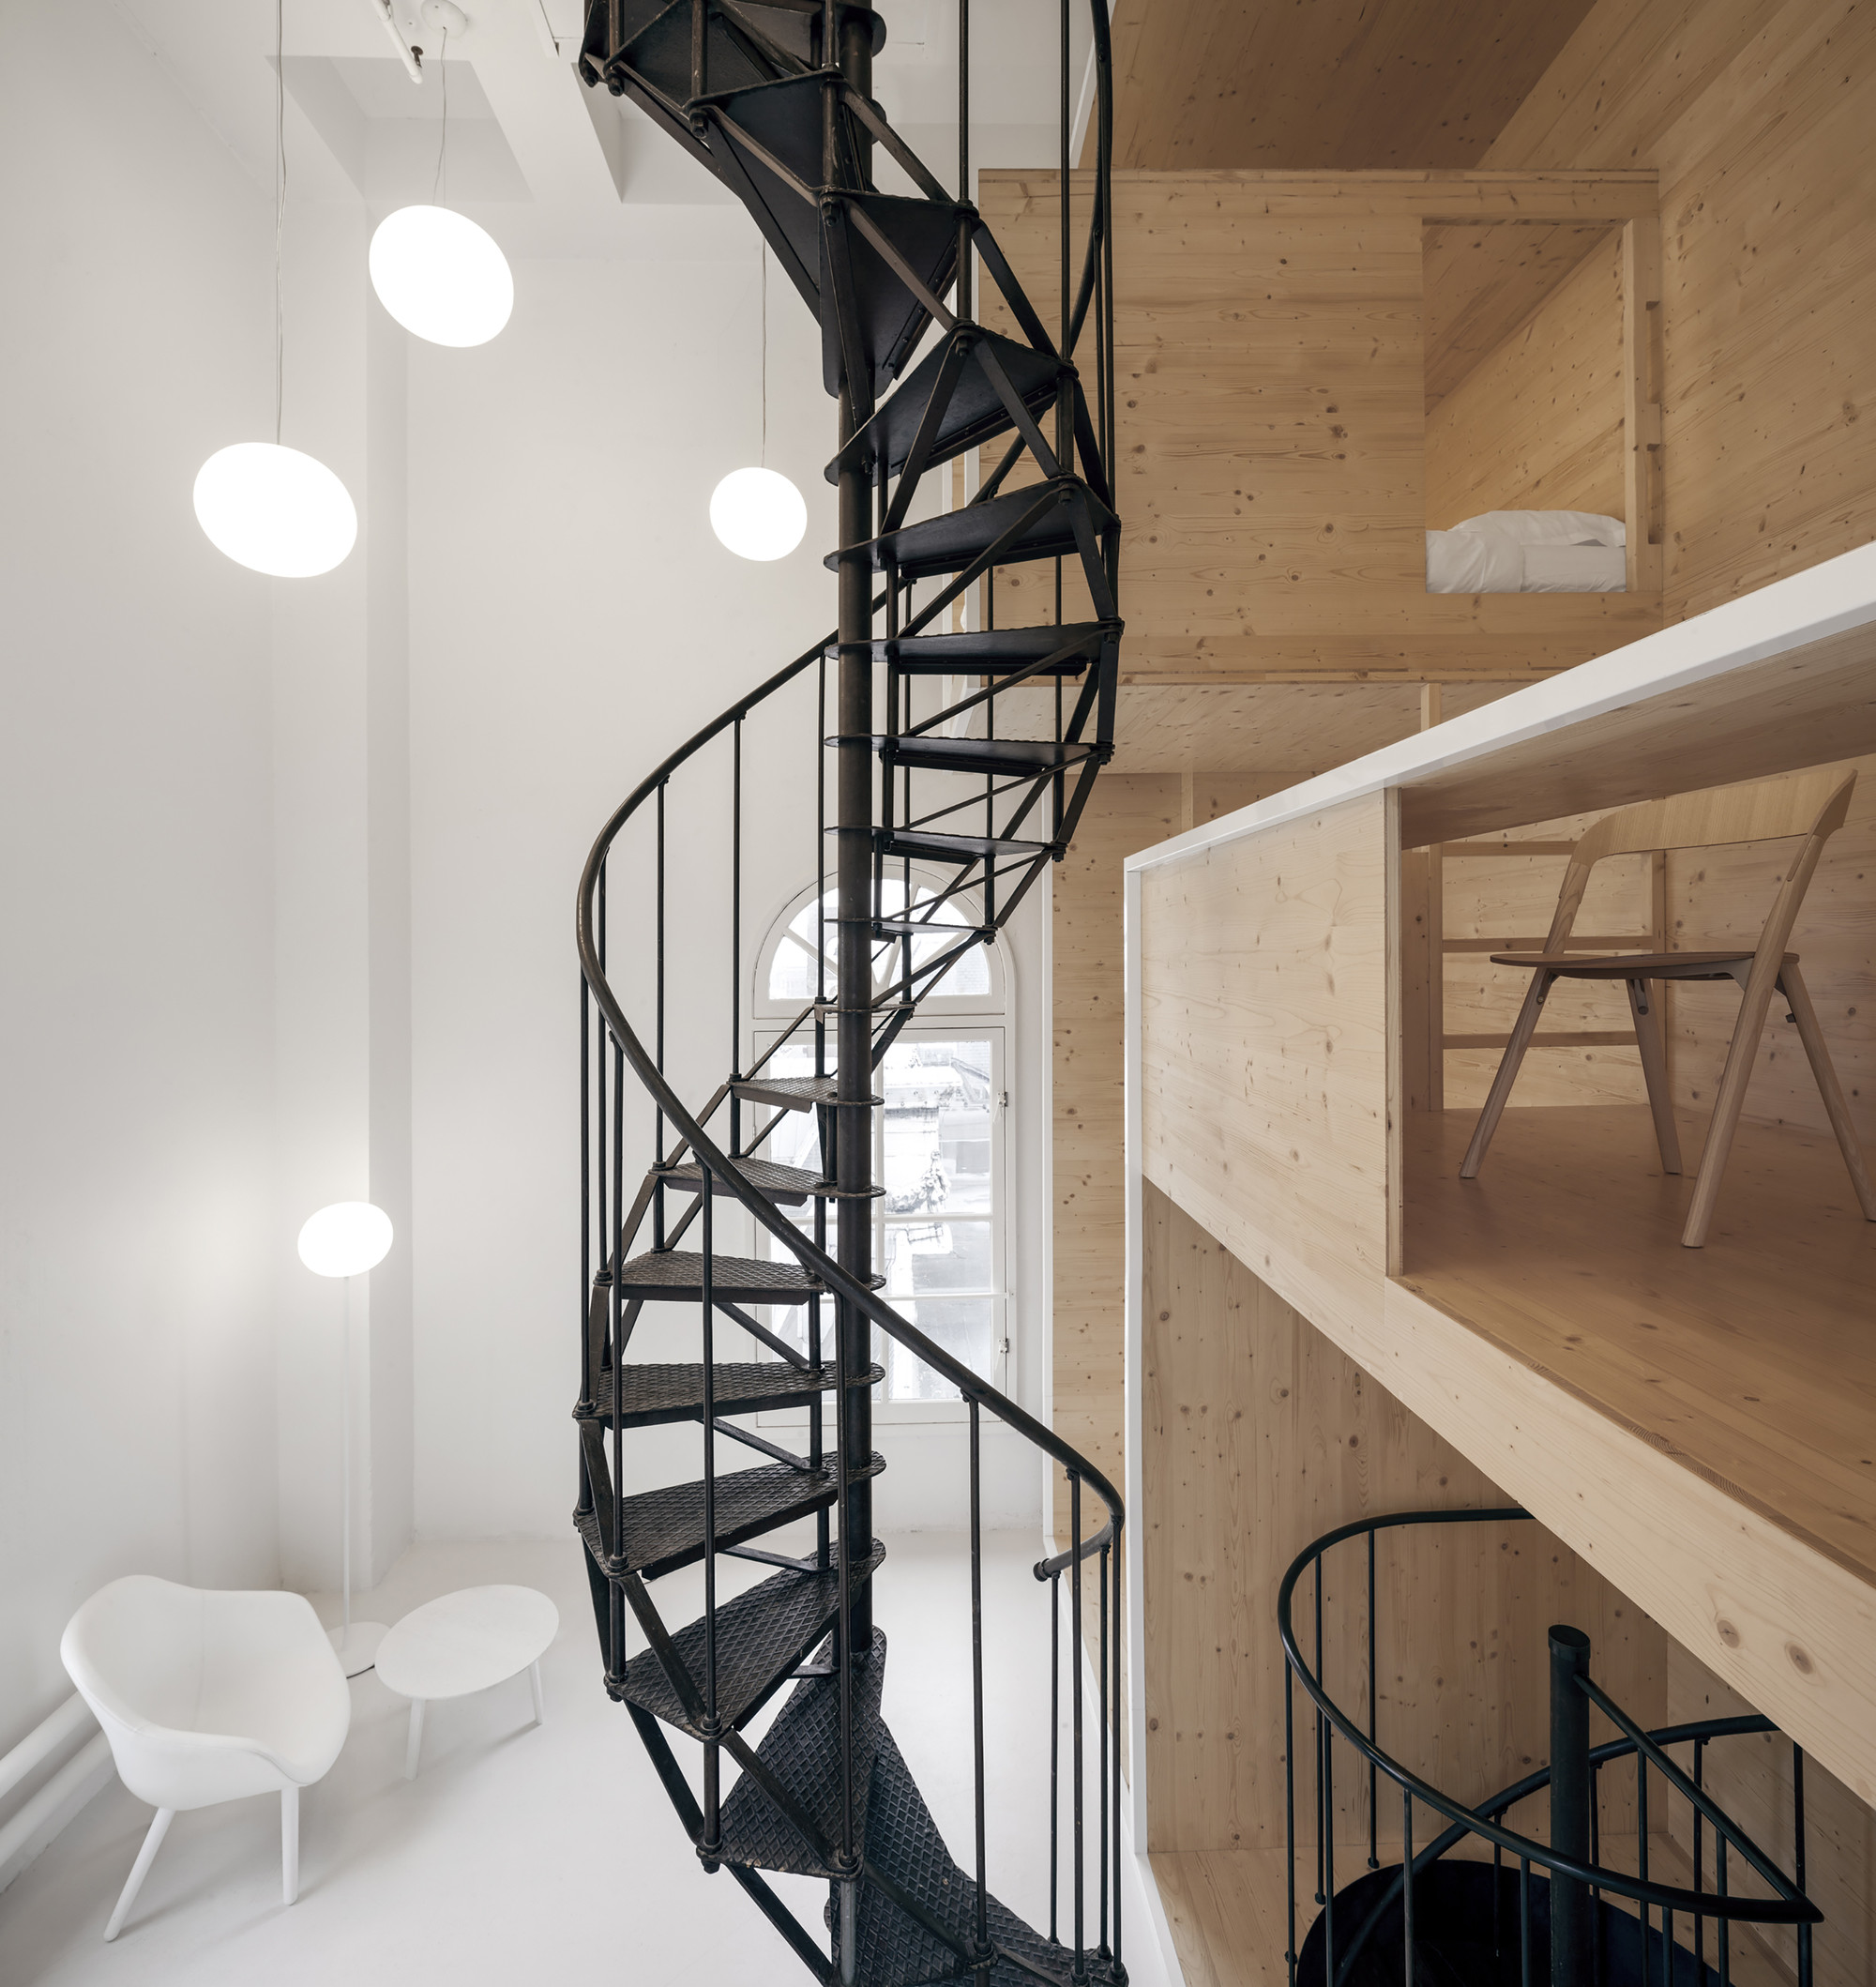 Cuarto en la Azotea / i29 interior architects